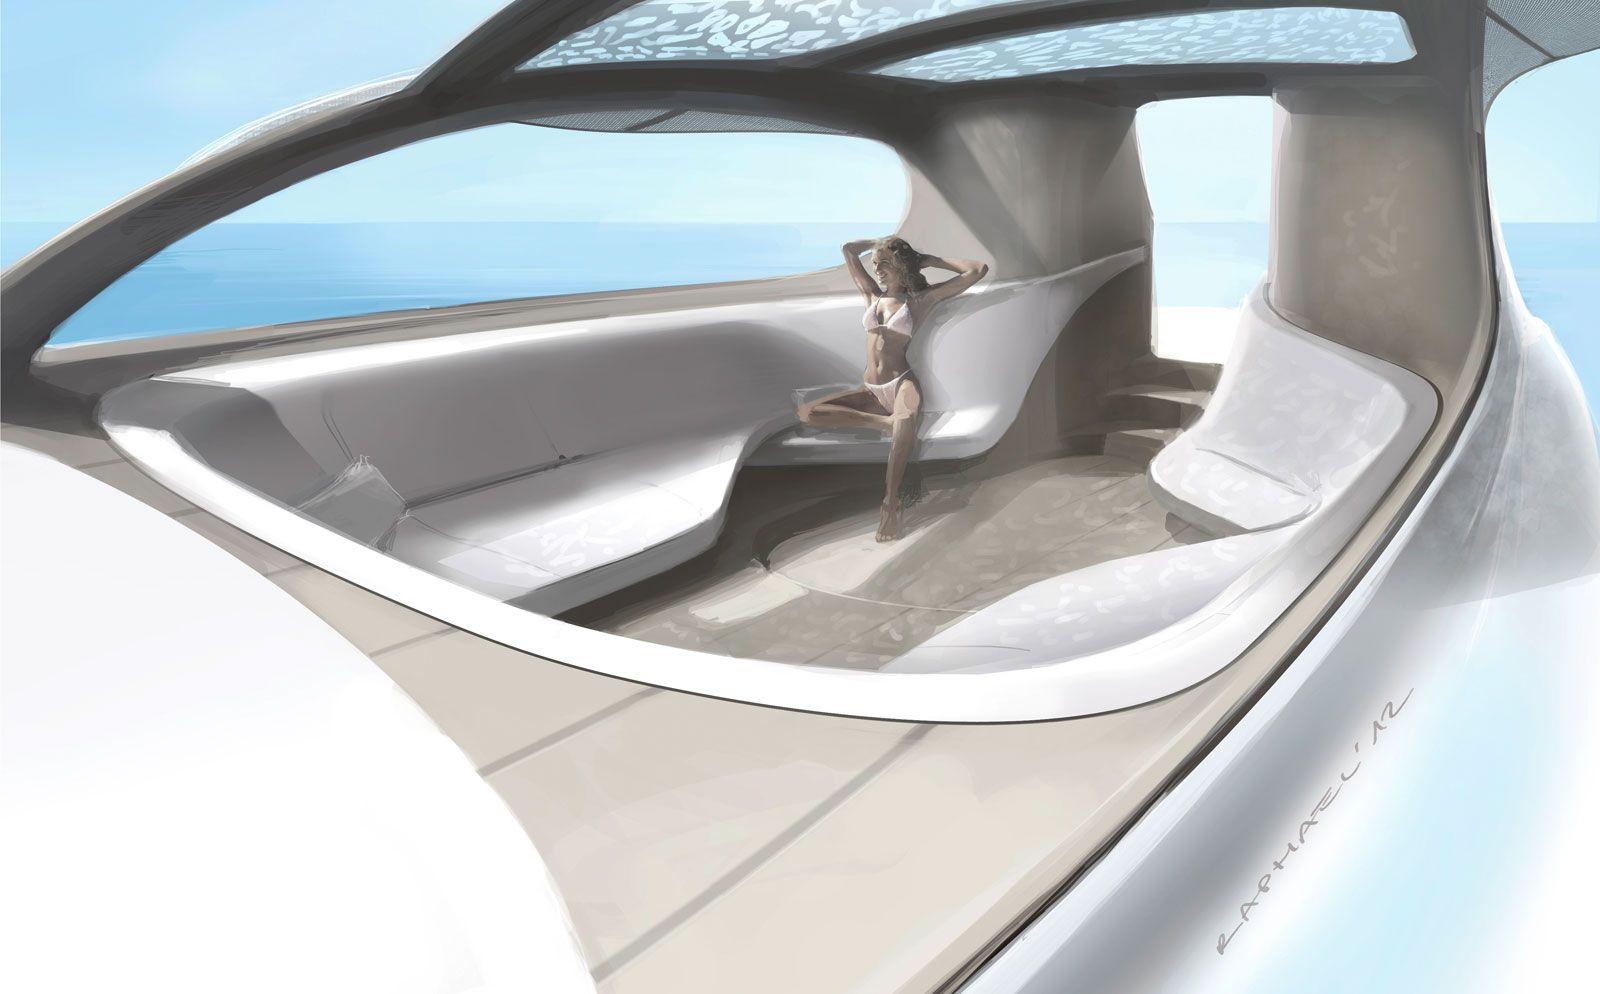 Yacht Design Jobs mercedes-benz silver arrows motor yacht interior design sketch